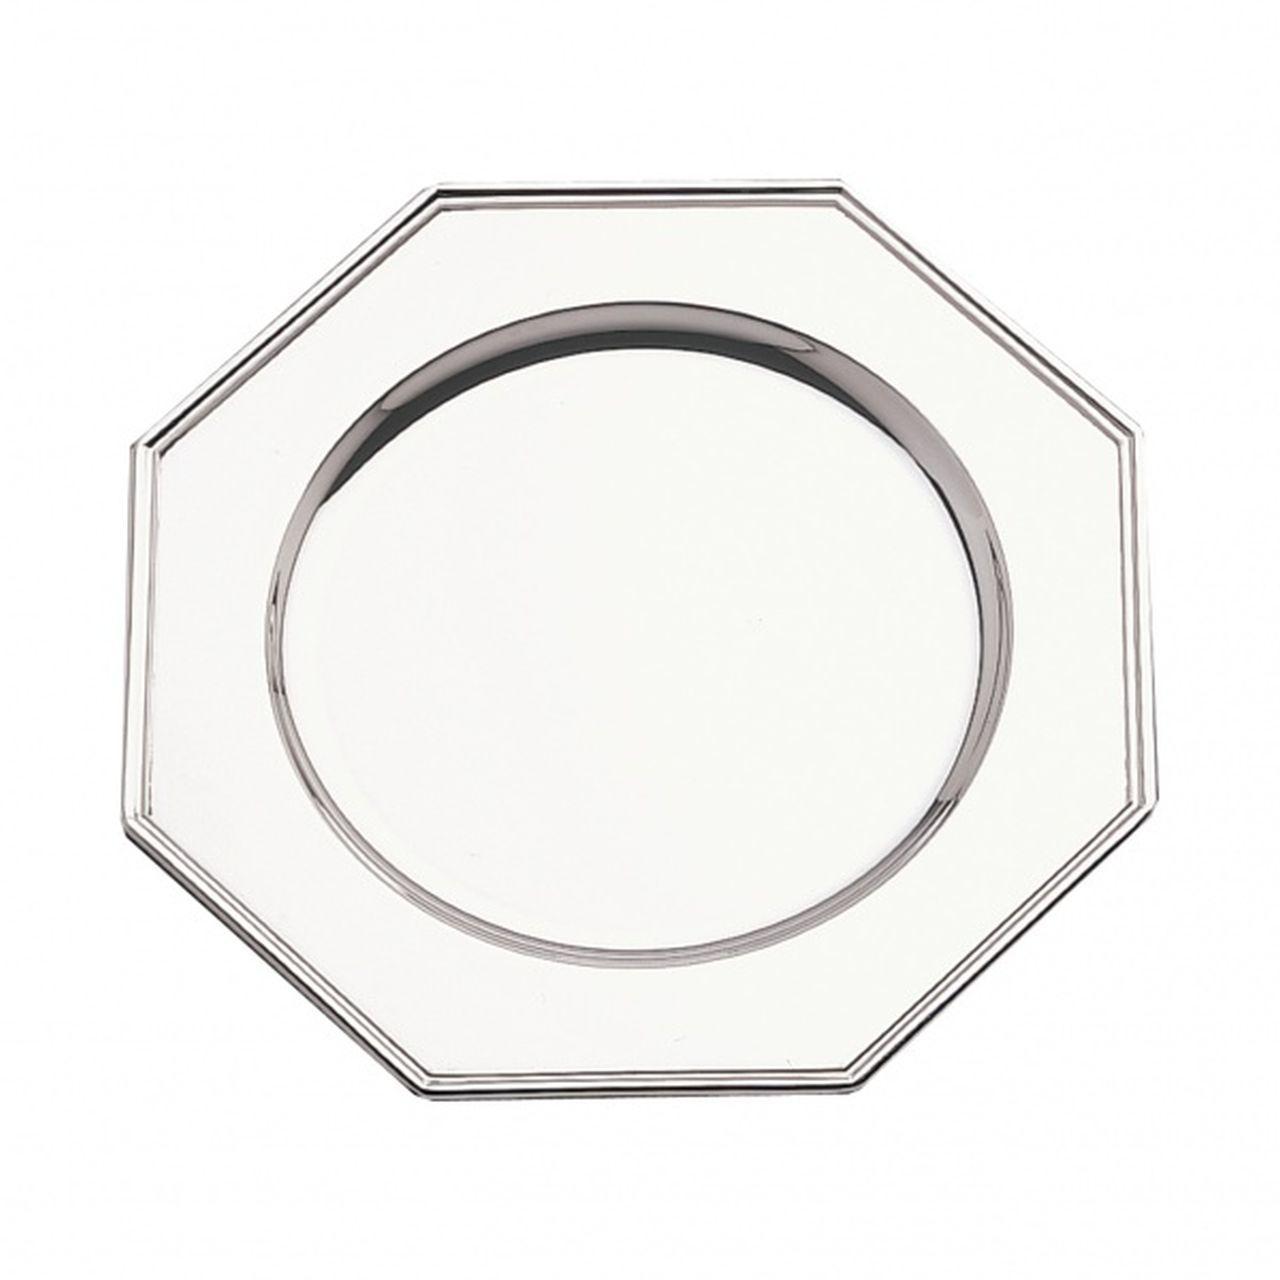 Sottopiatto argentato argento sheffield stile ottagonale cm.30x30